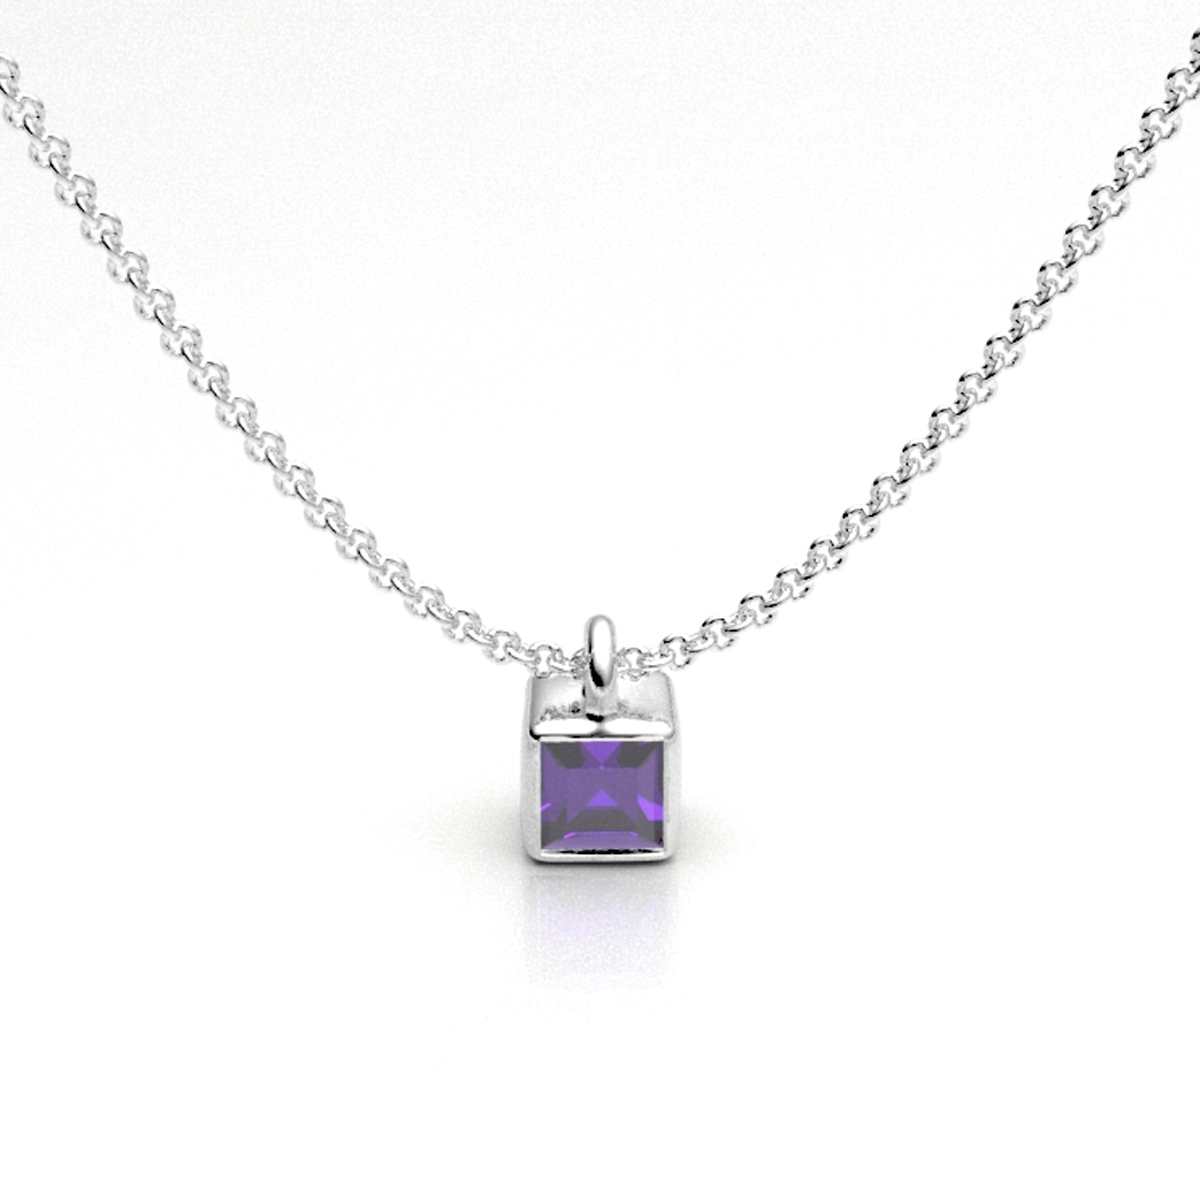 Amethyst Ice Cube Pendant - X2216-A